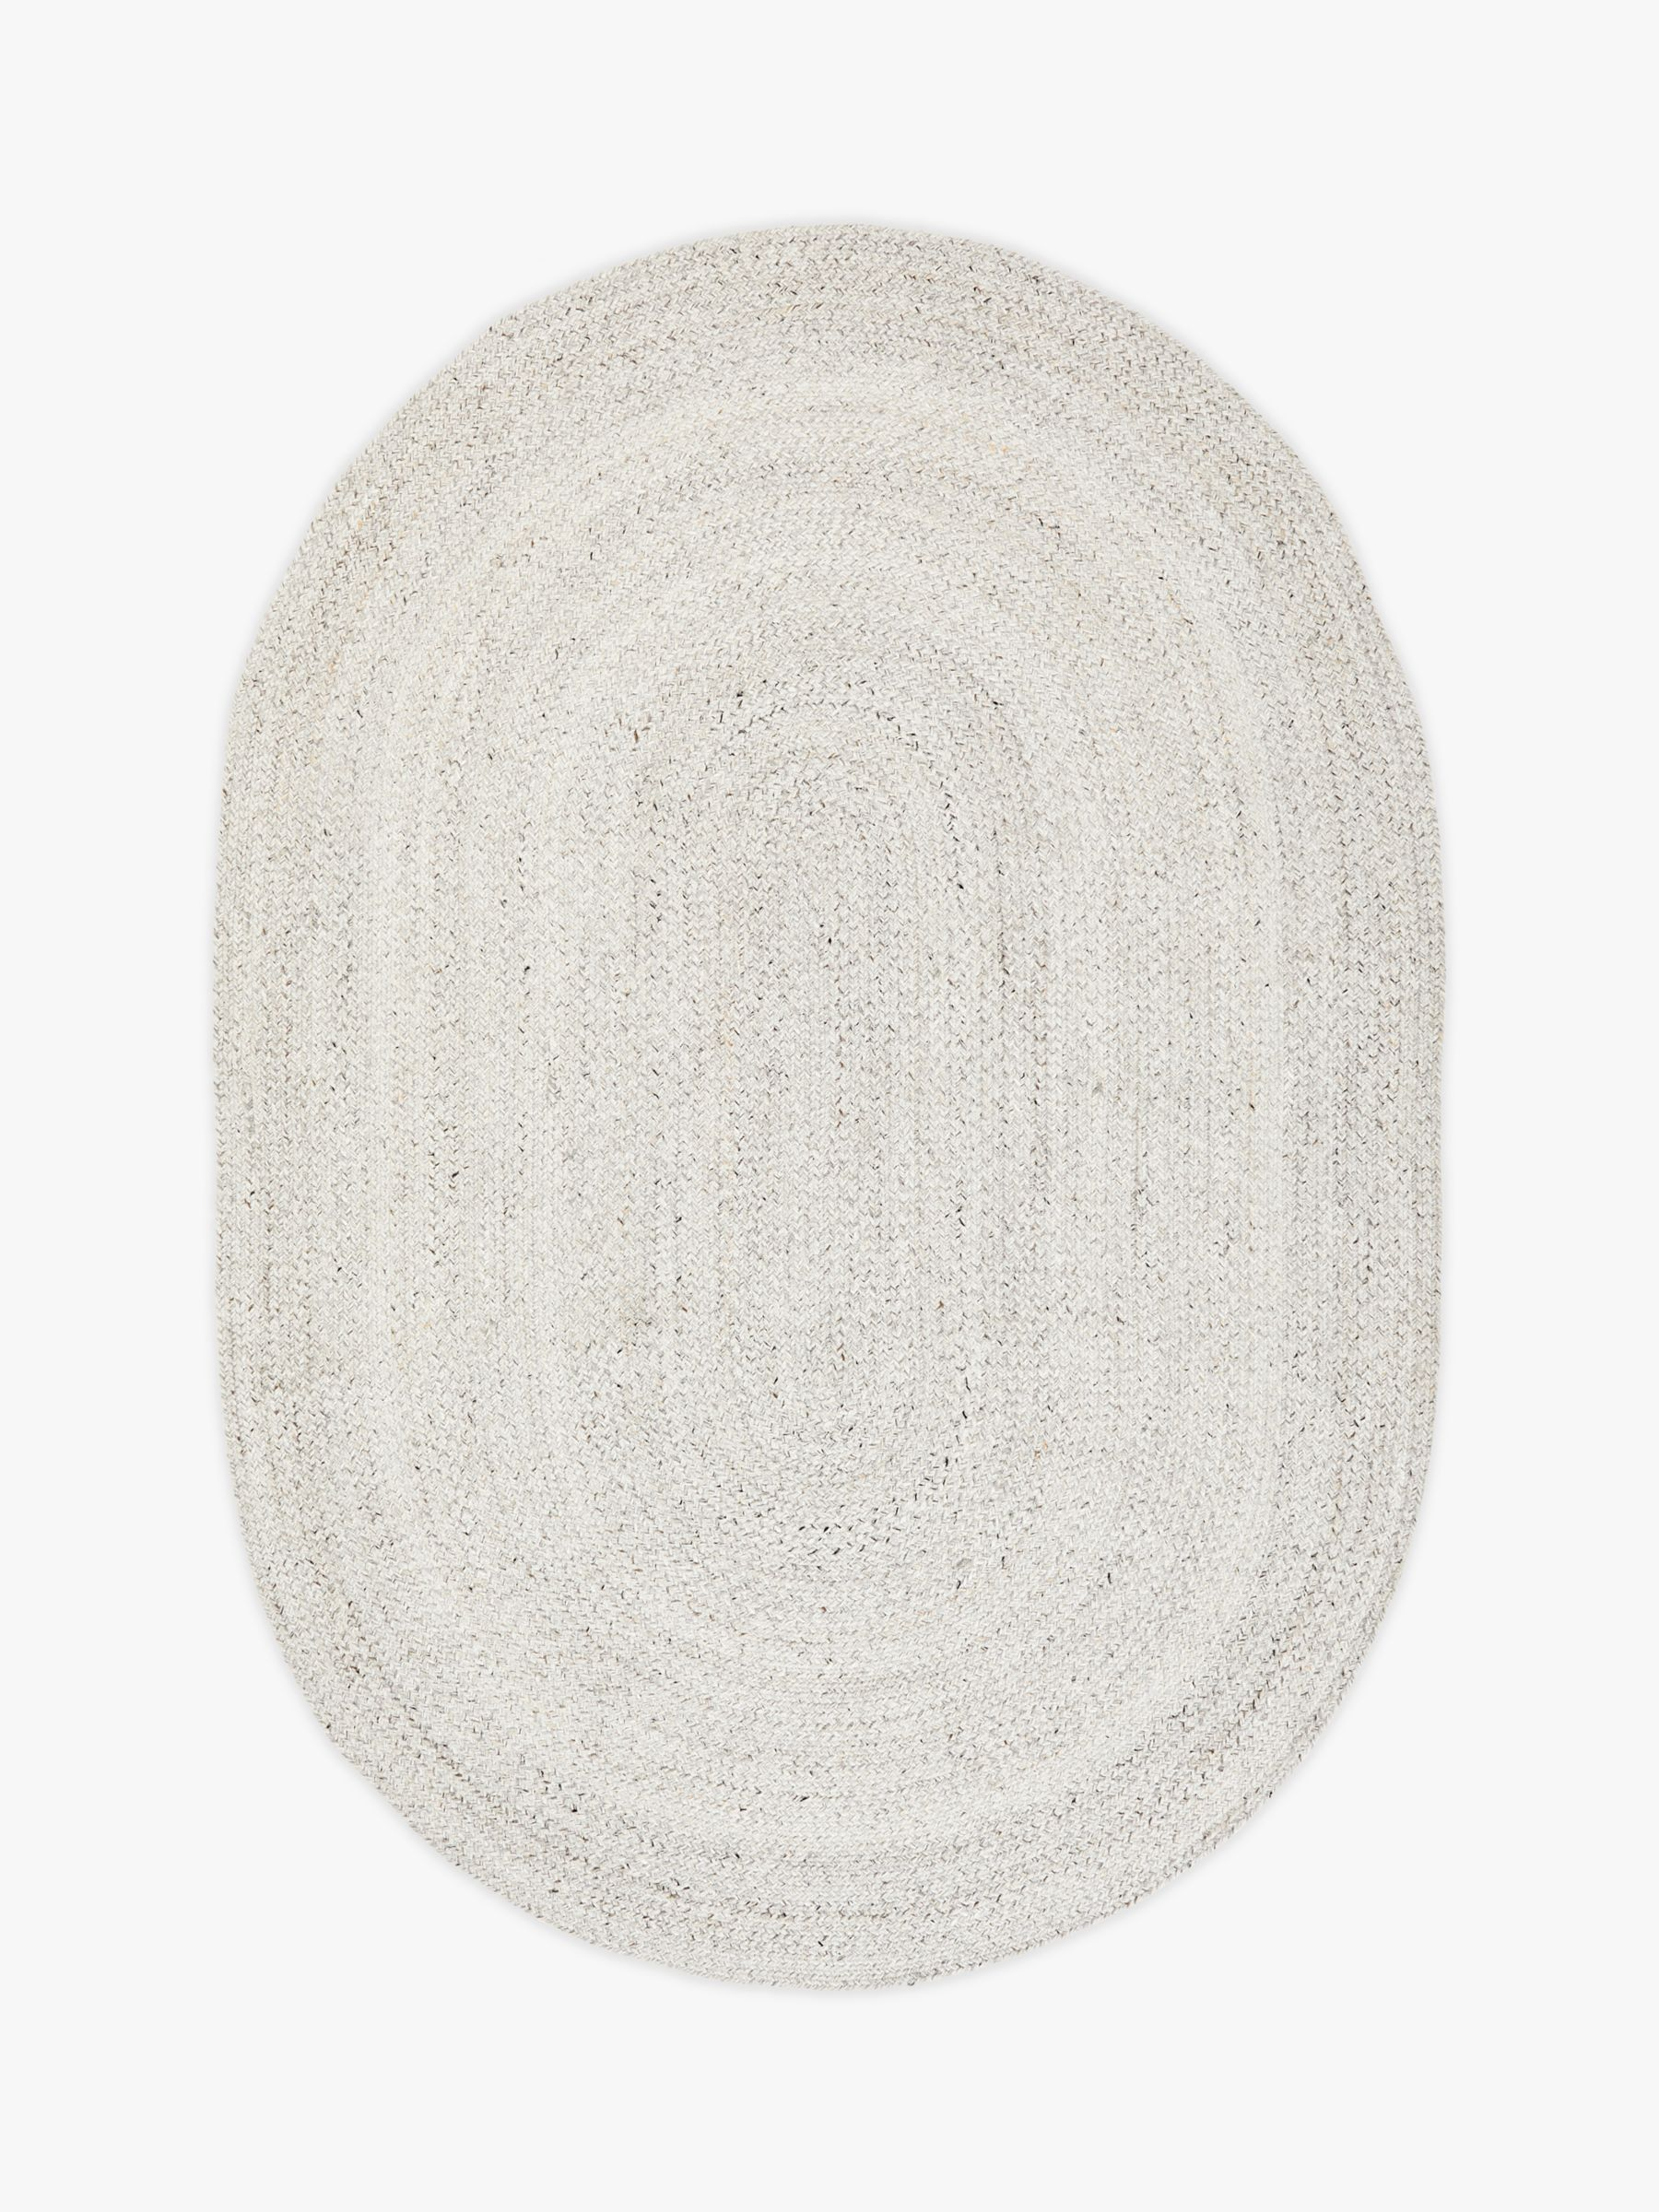 John Lewis & Partners Indoor & Outdoor Braided Oval Rug, Marl Grey, L240 x W170 cm